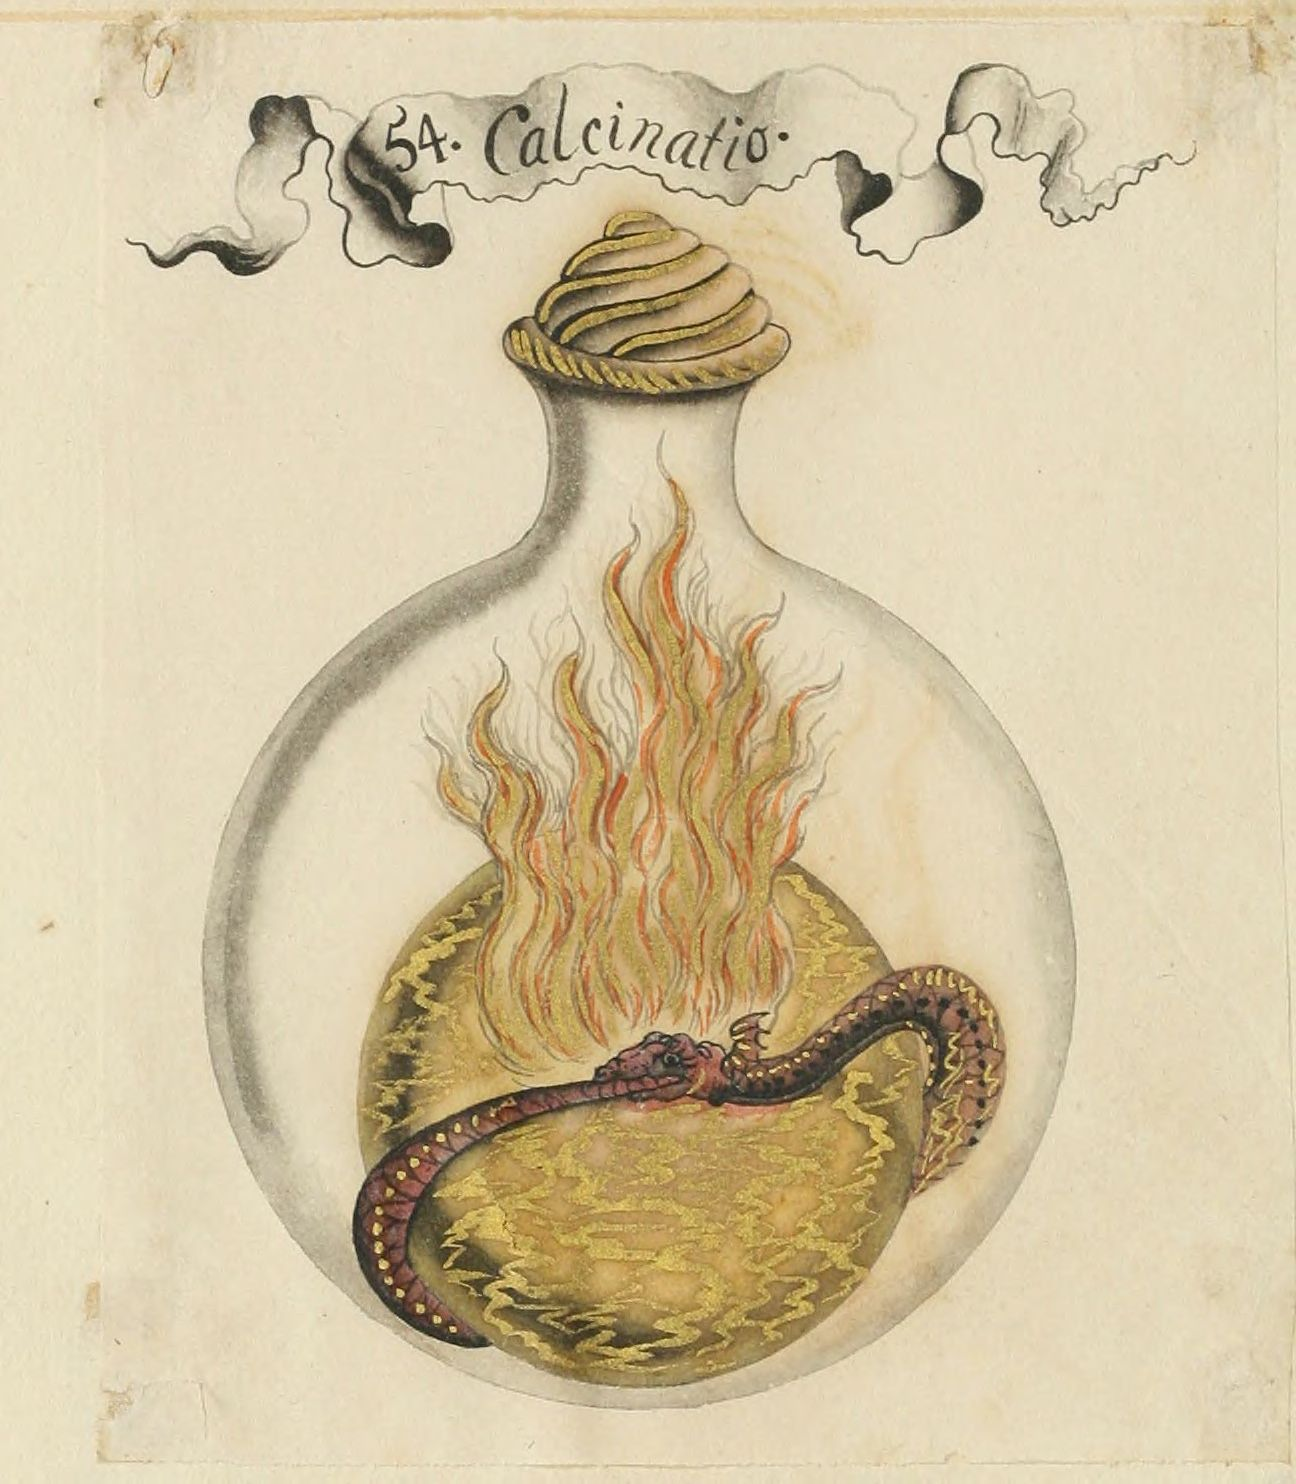 crowning-39-calcinatio